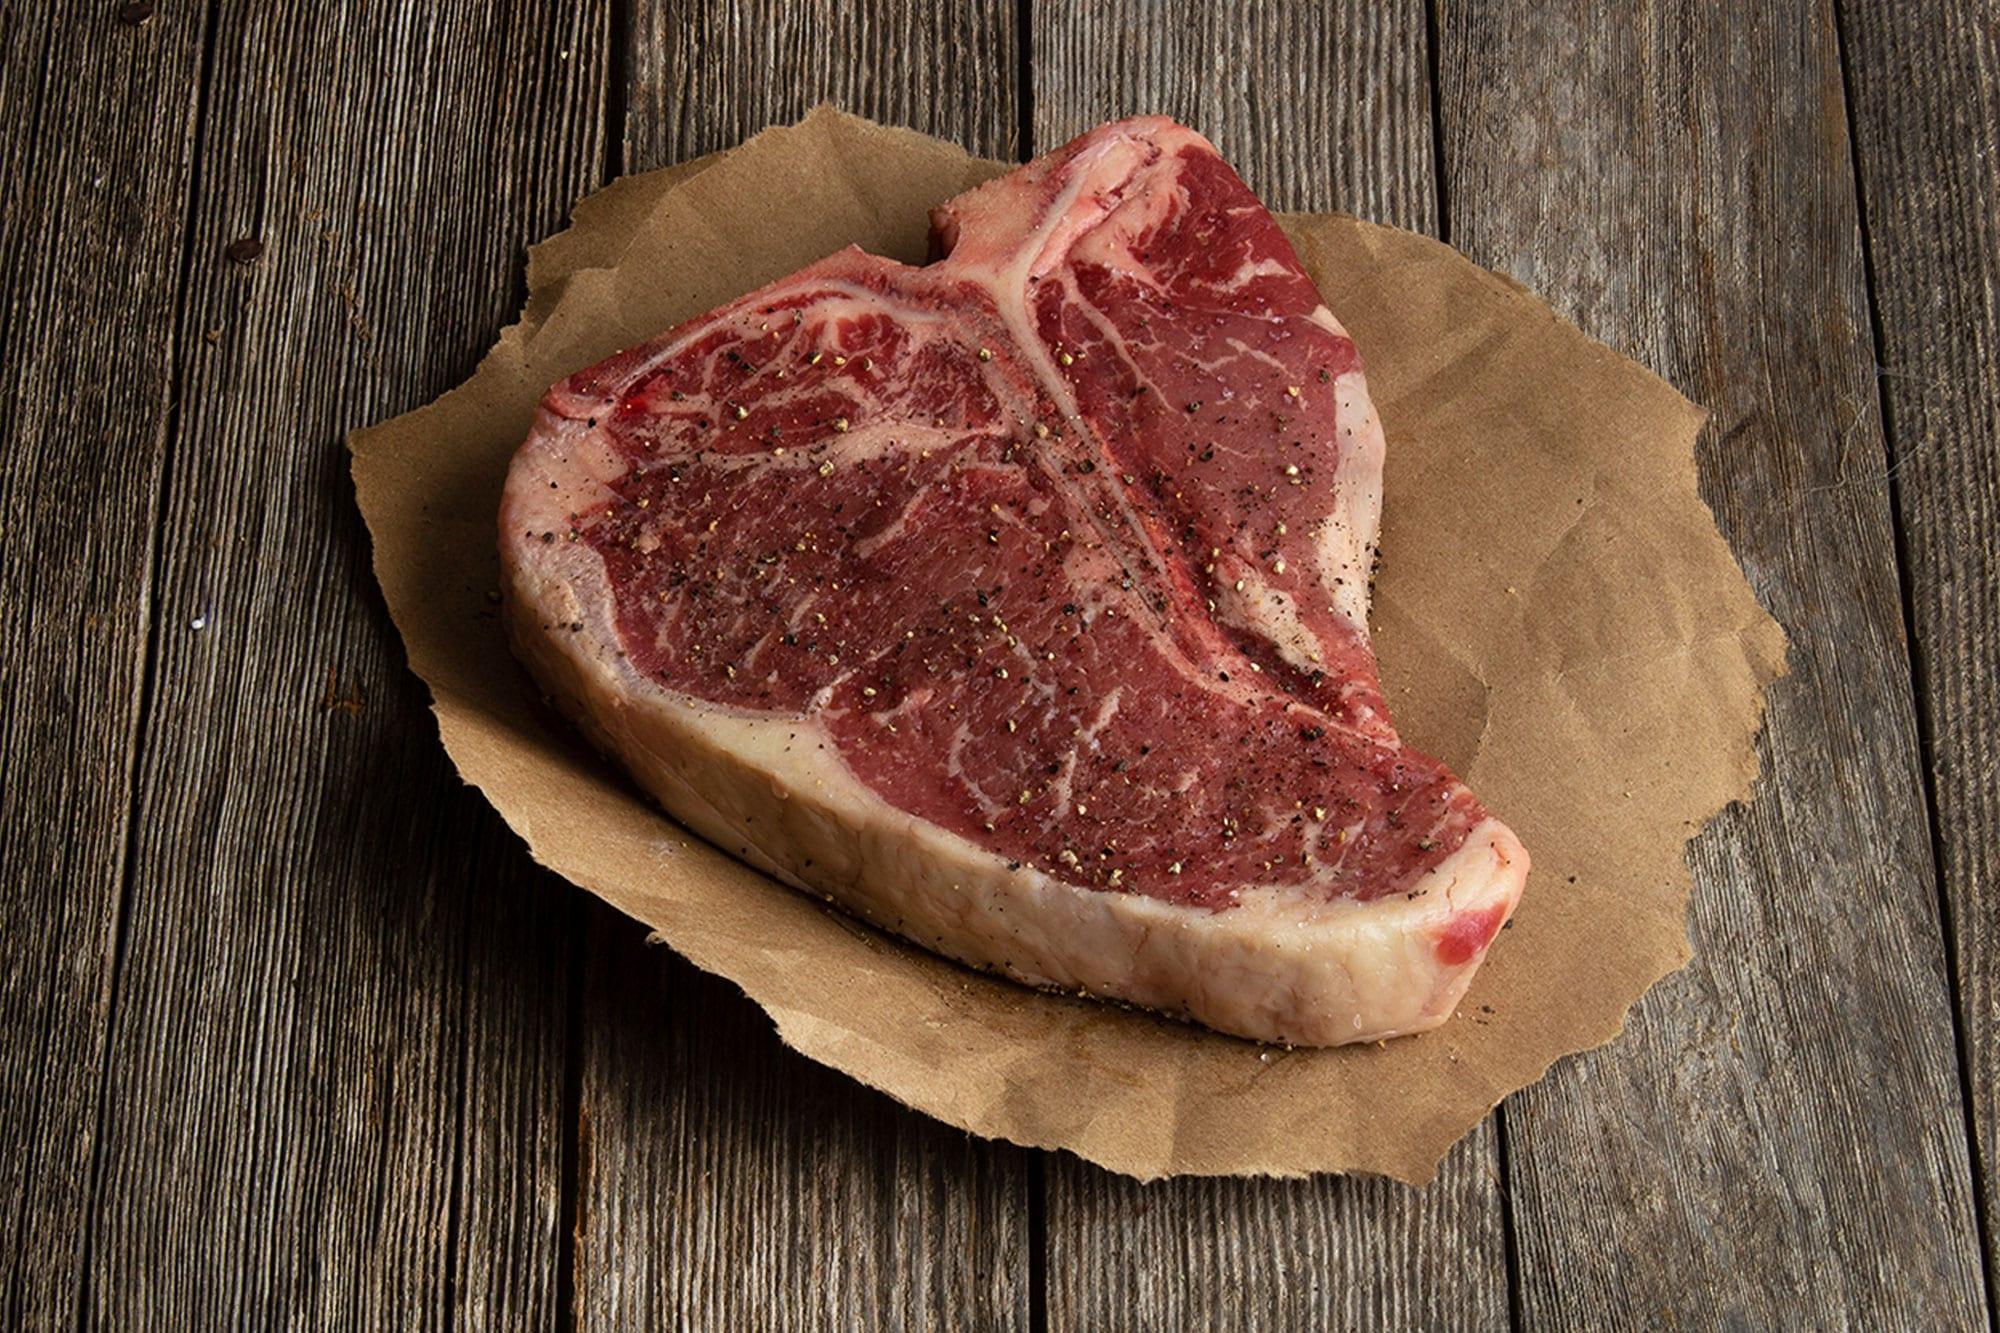 Nebraska Star® Beef | USDA Choice and Prime Beef